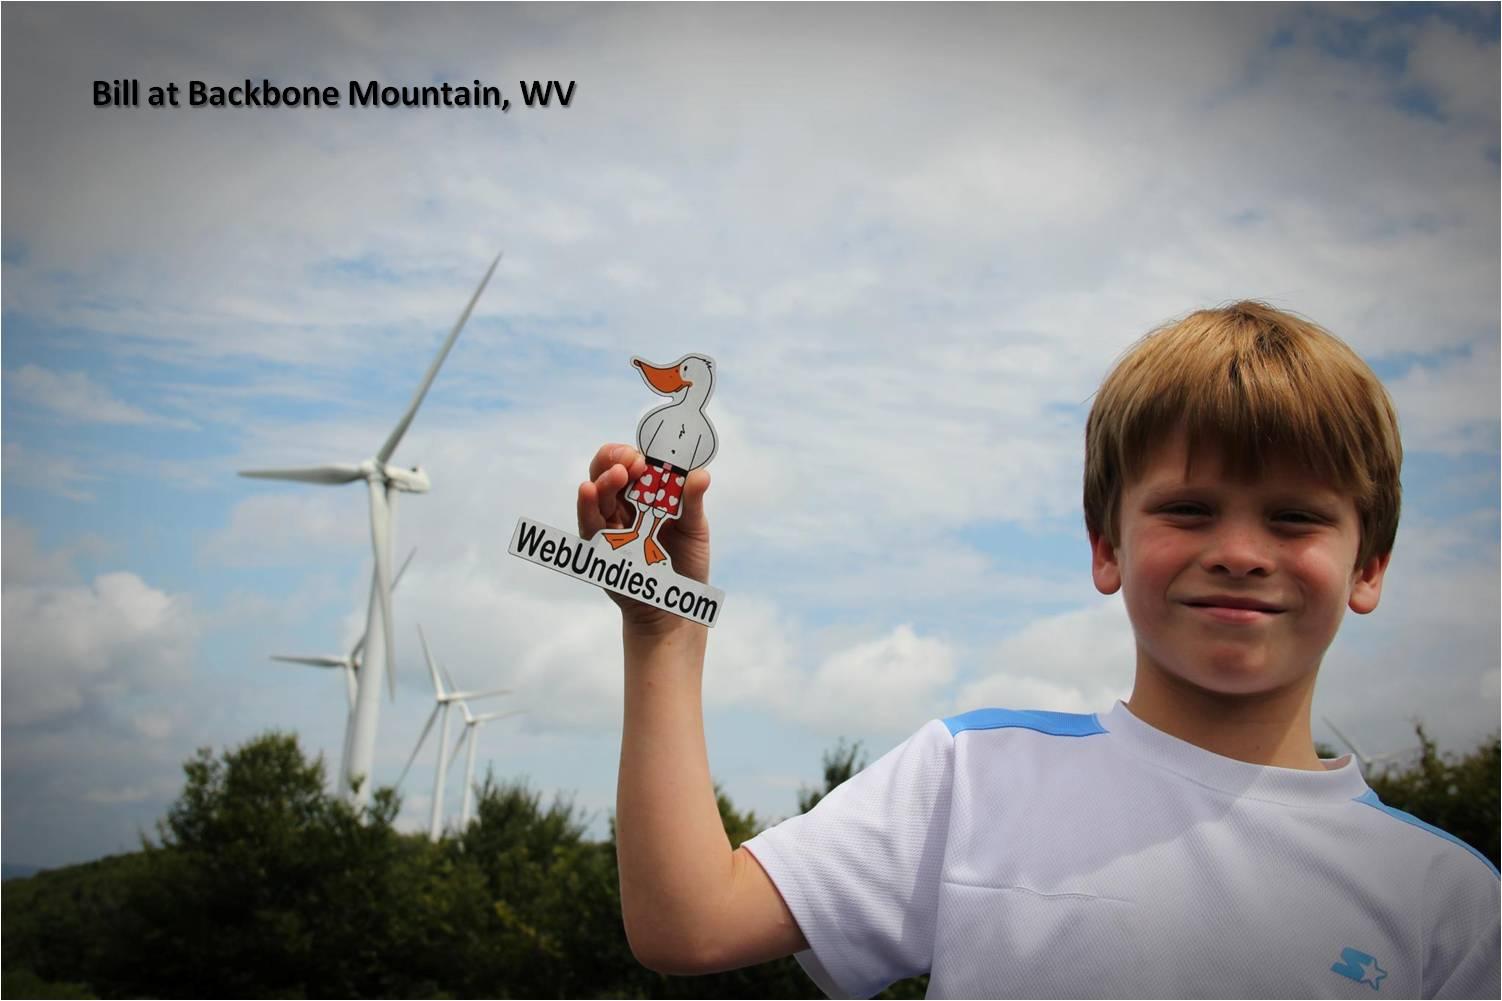 Bill visits WV windmills with a friend